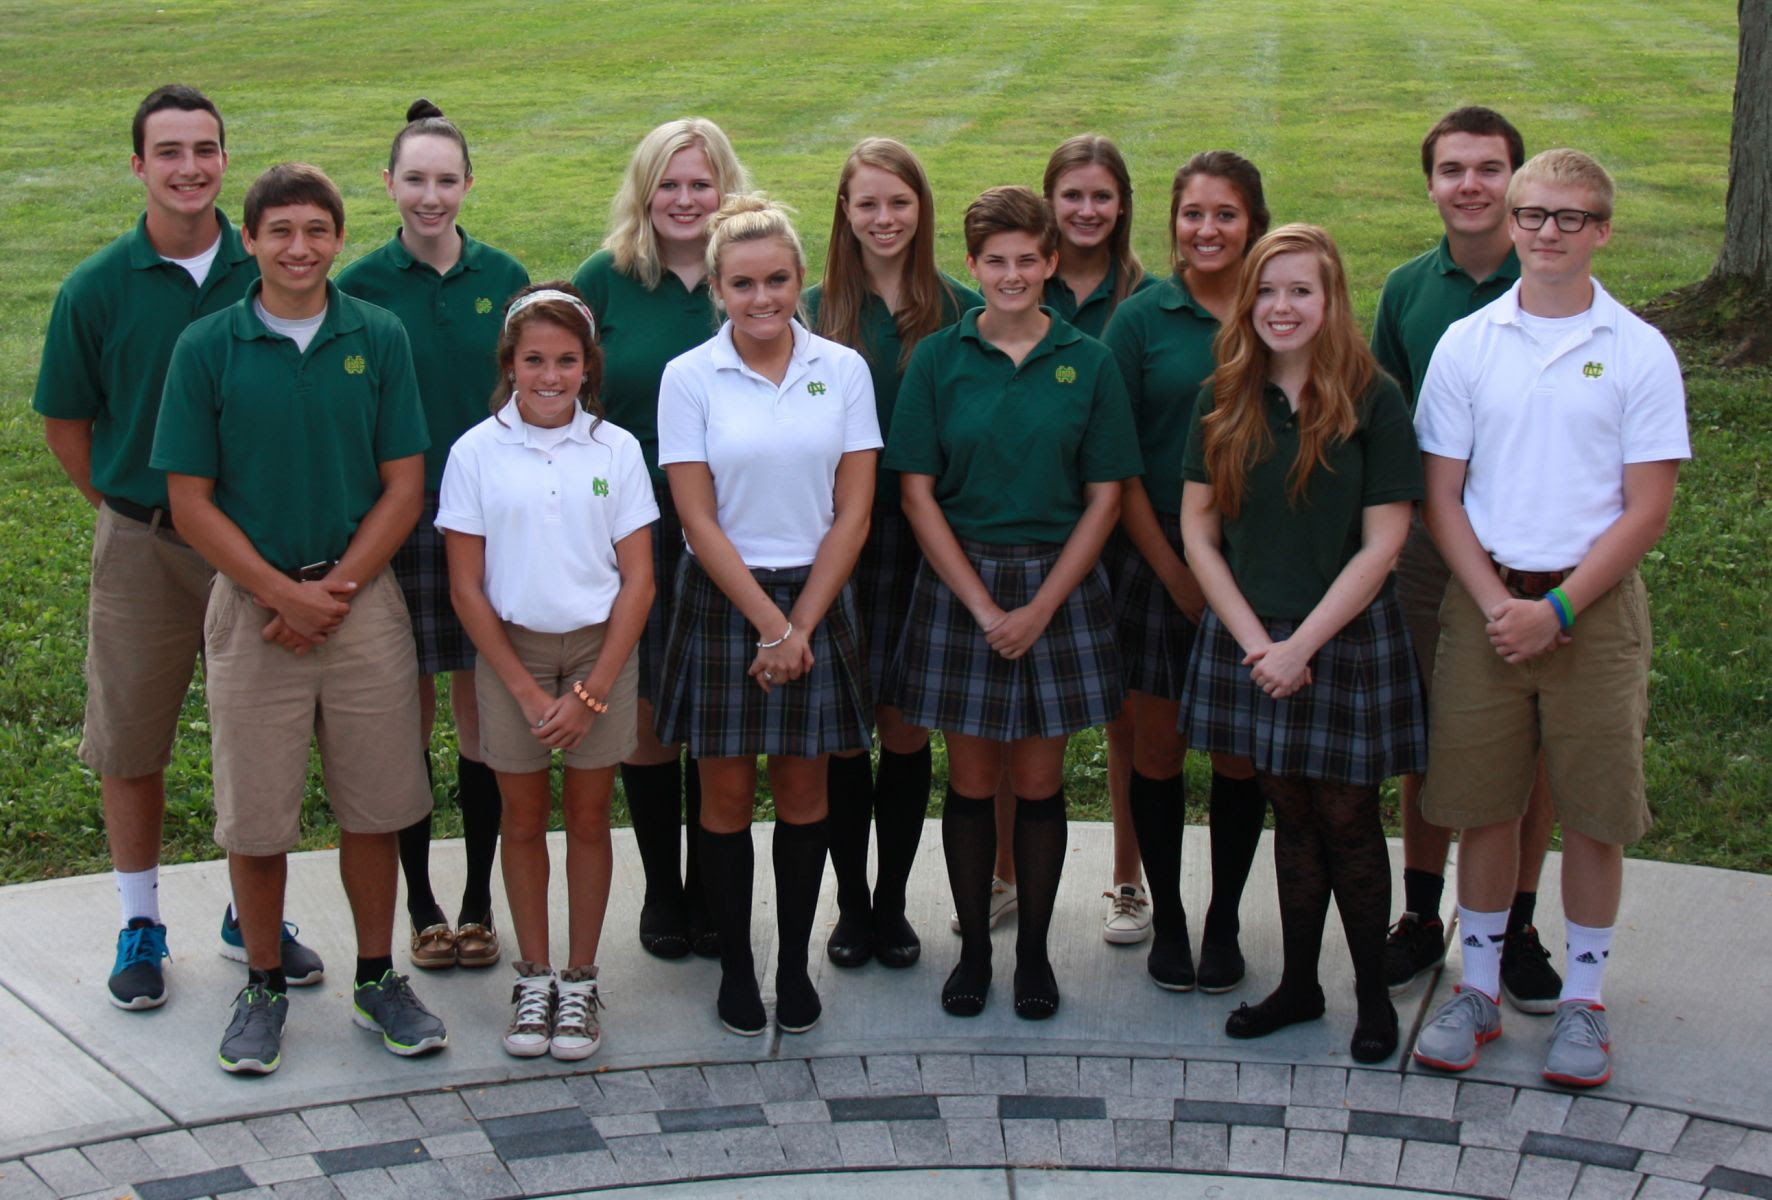 10 Items to Update Your Catholic School Uniform - College